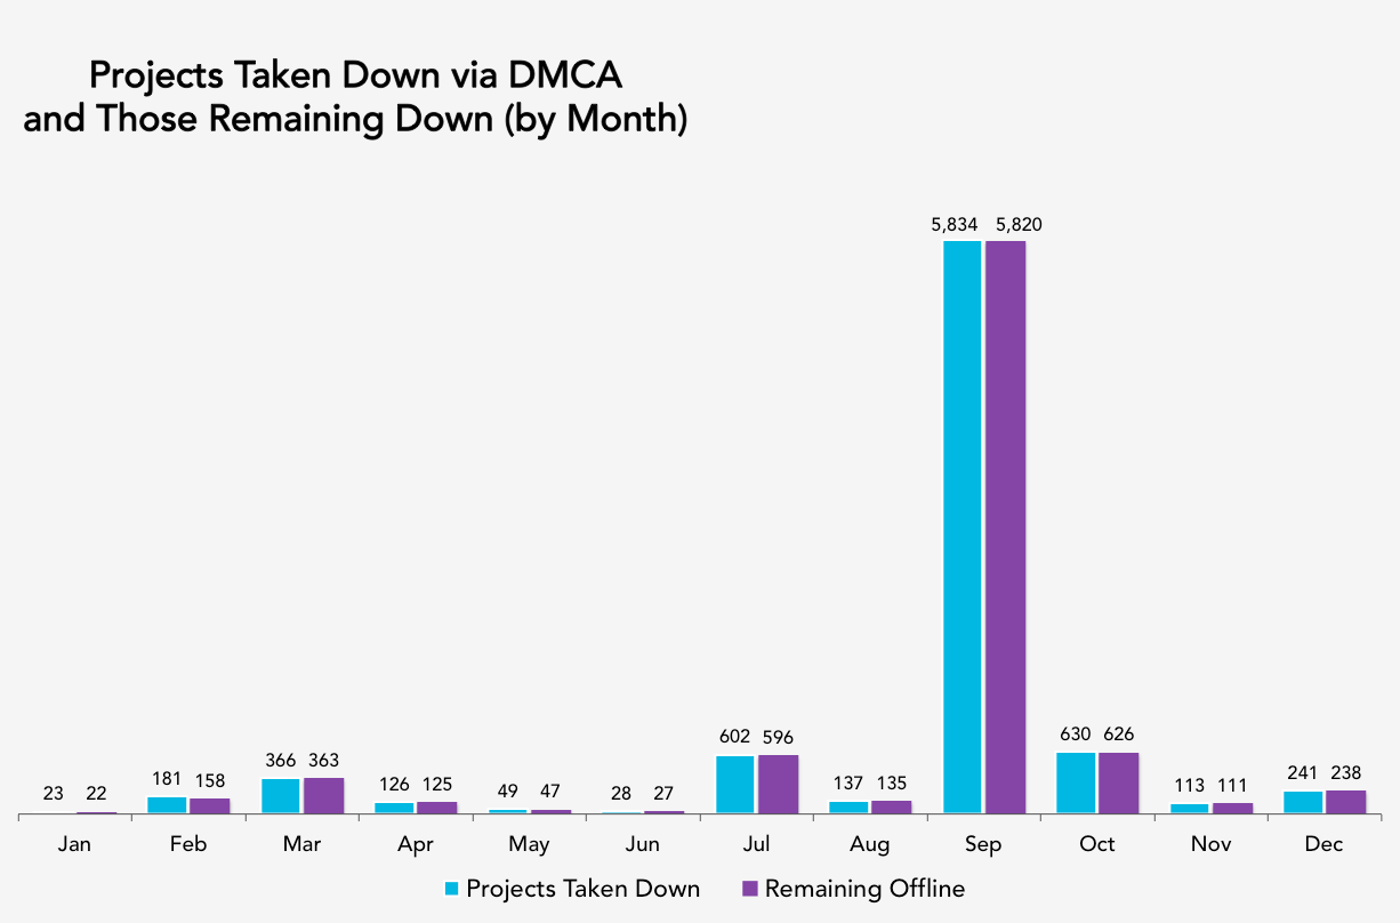 Projects Taken Down - Bar Graph